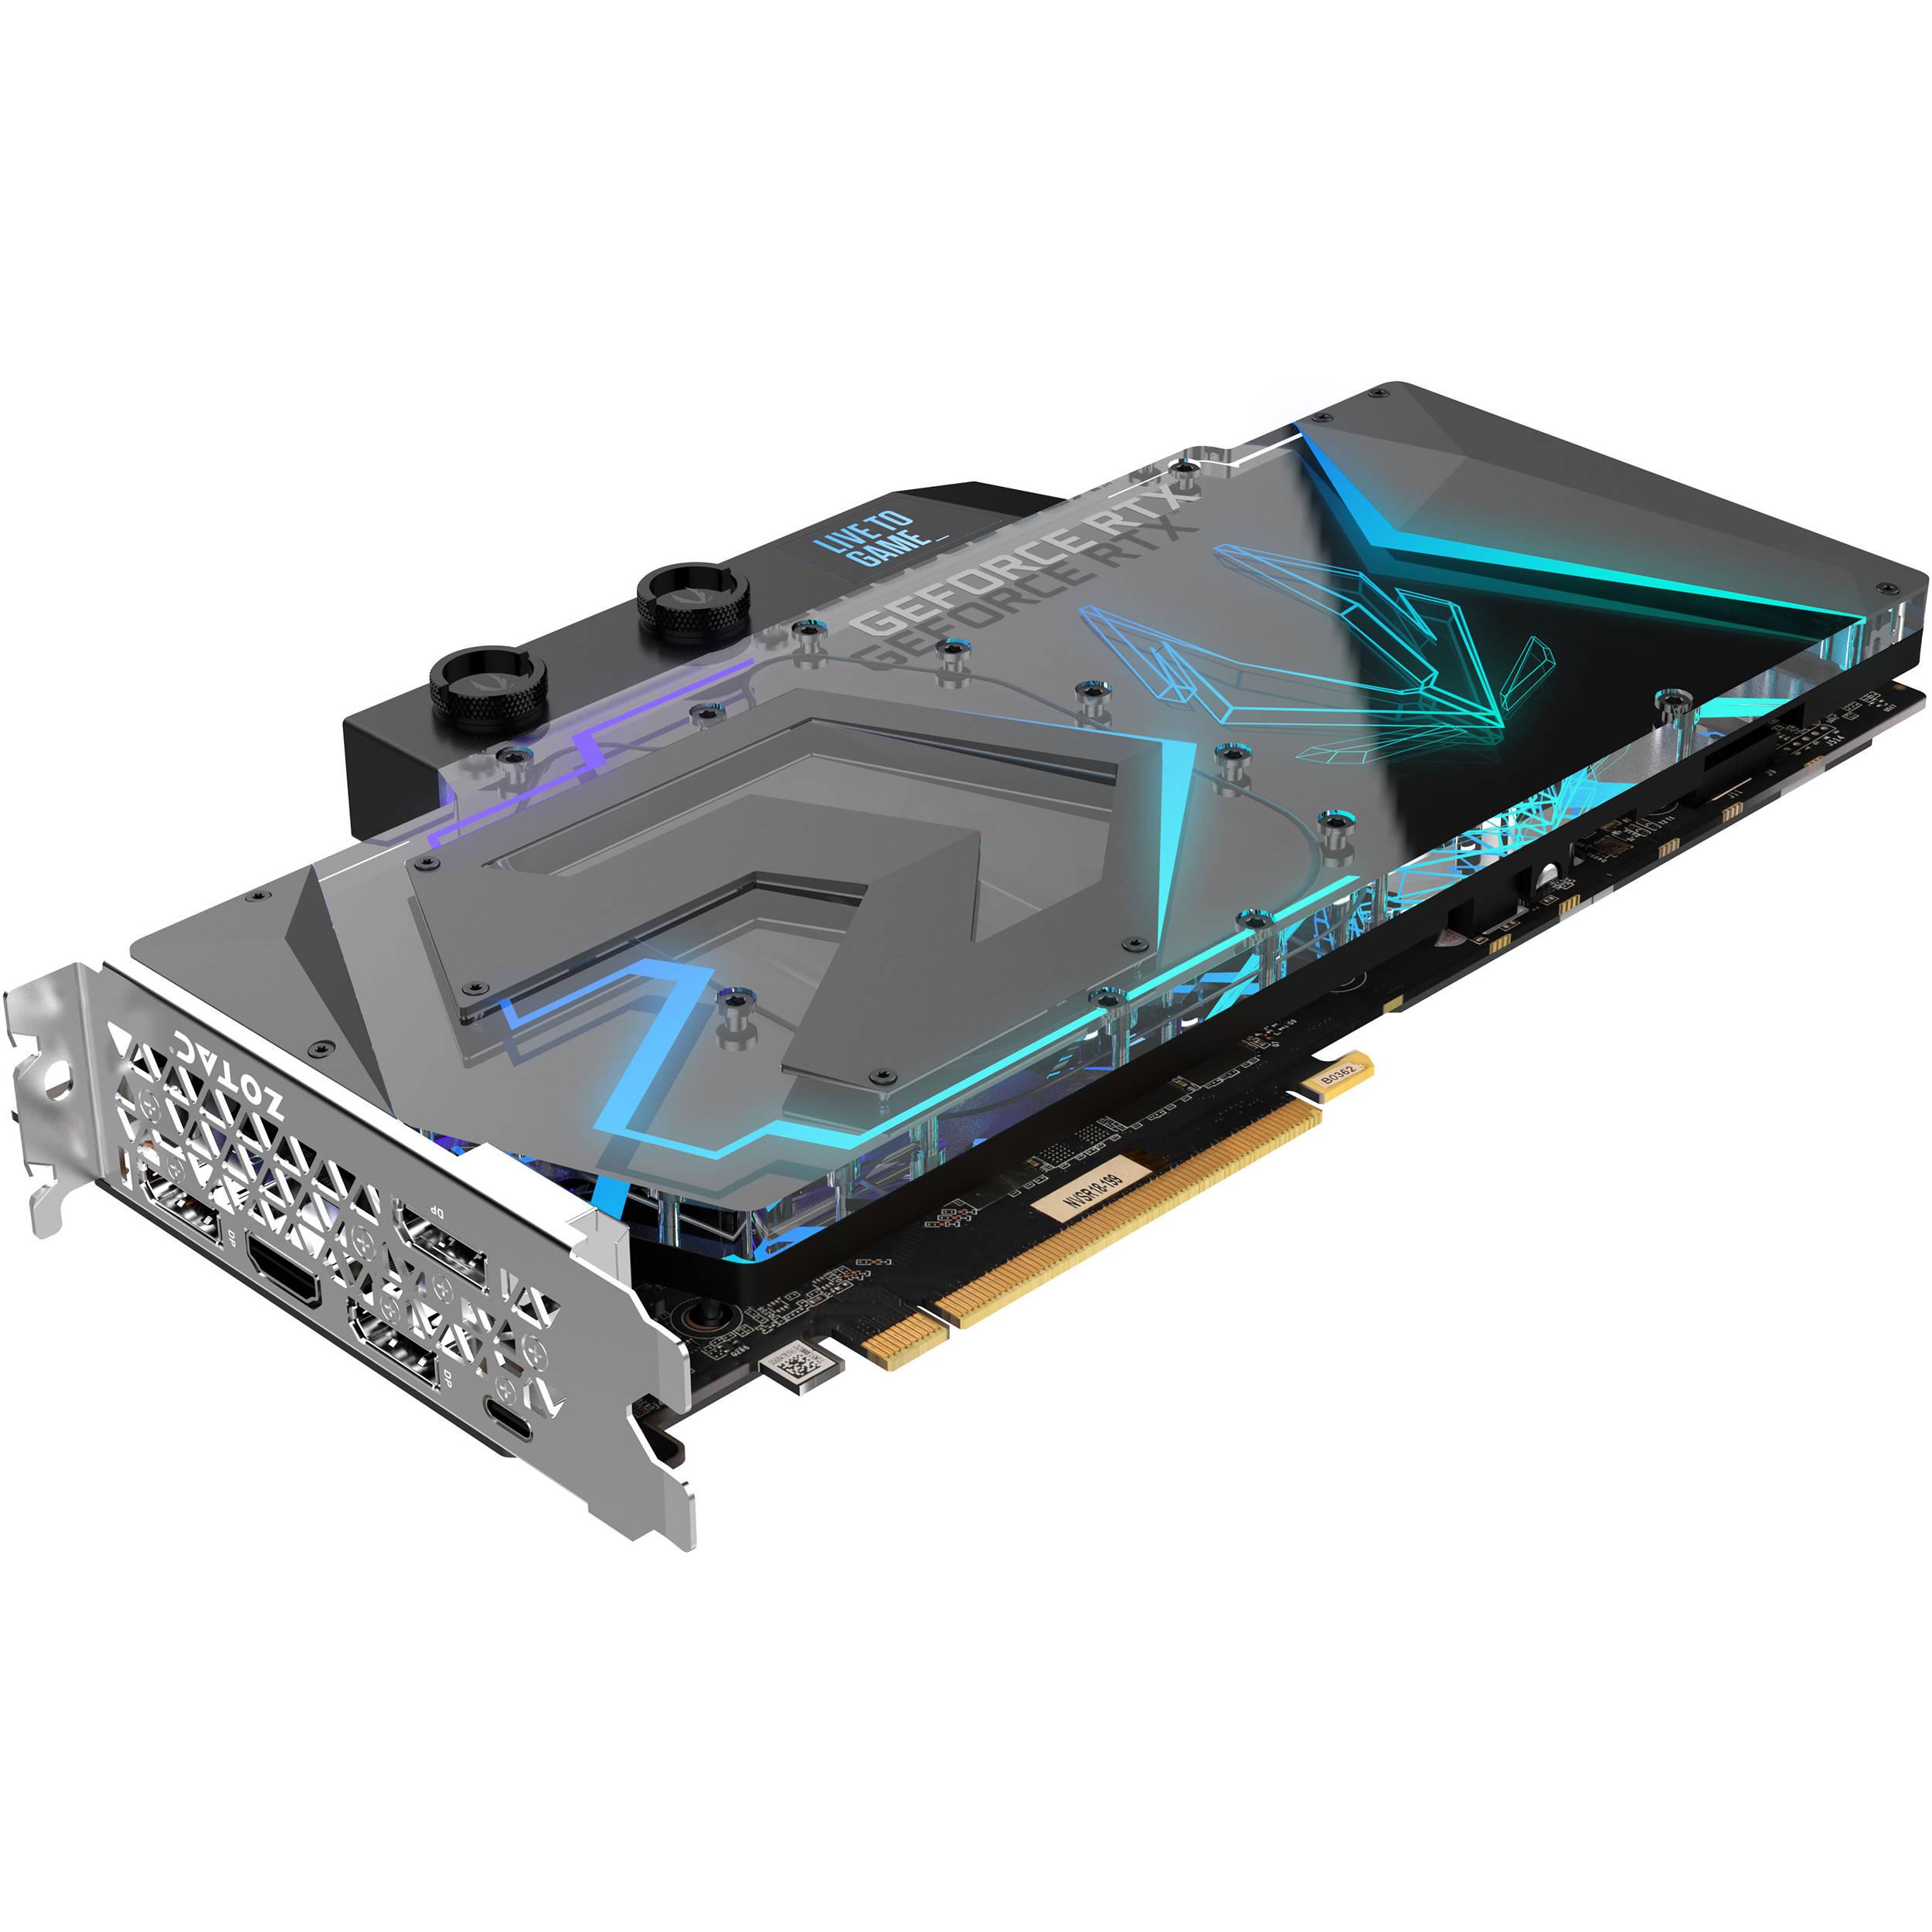 ZOTAC GAMING GeForce RTX 2080 Ti ArcticStorm Graphics Card